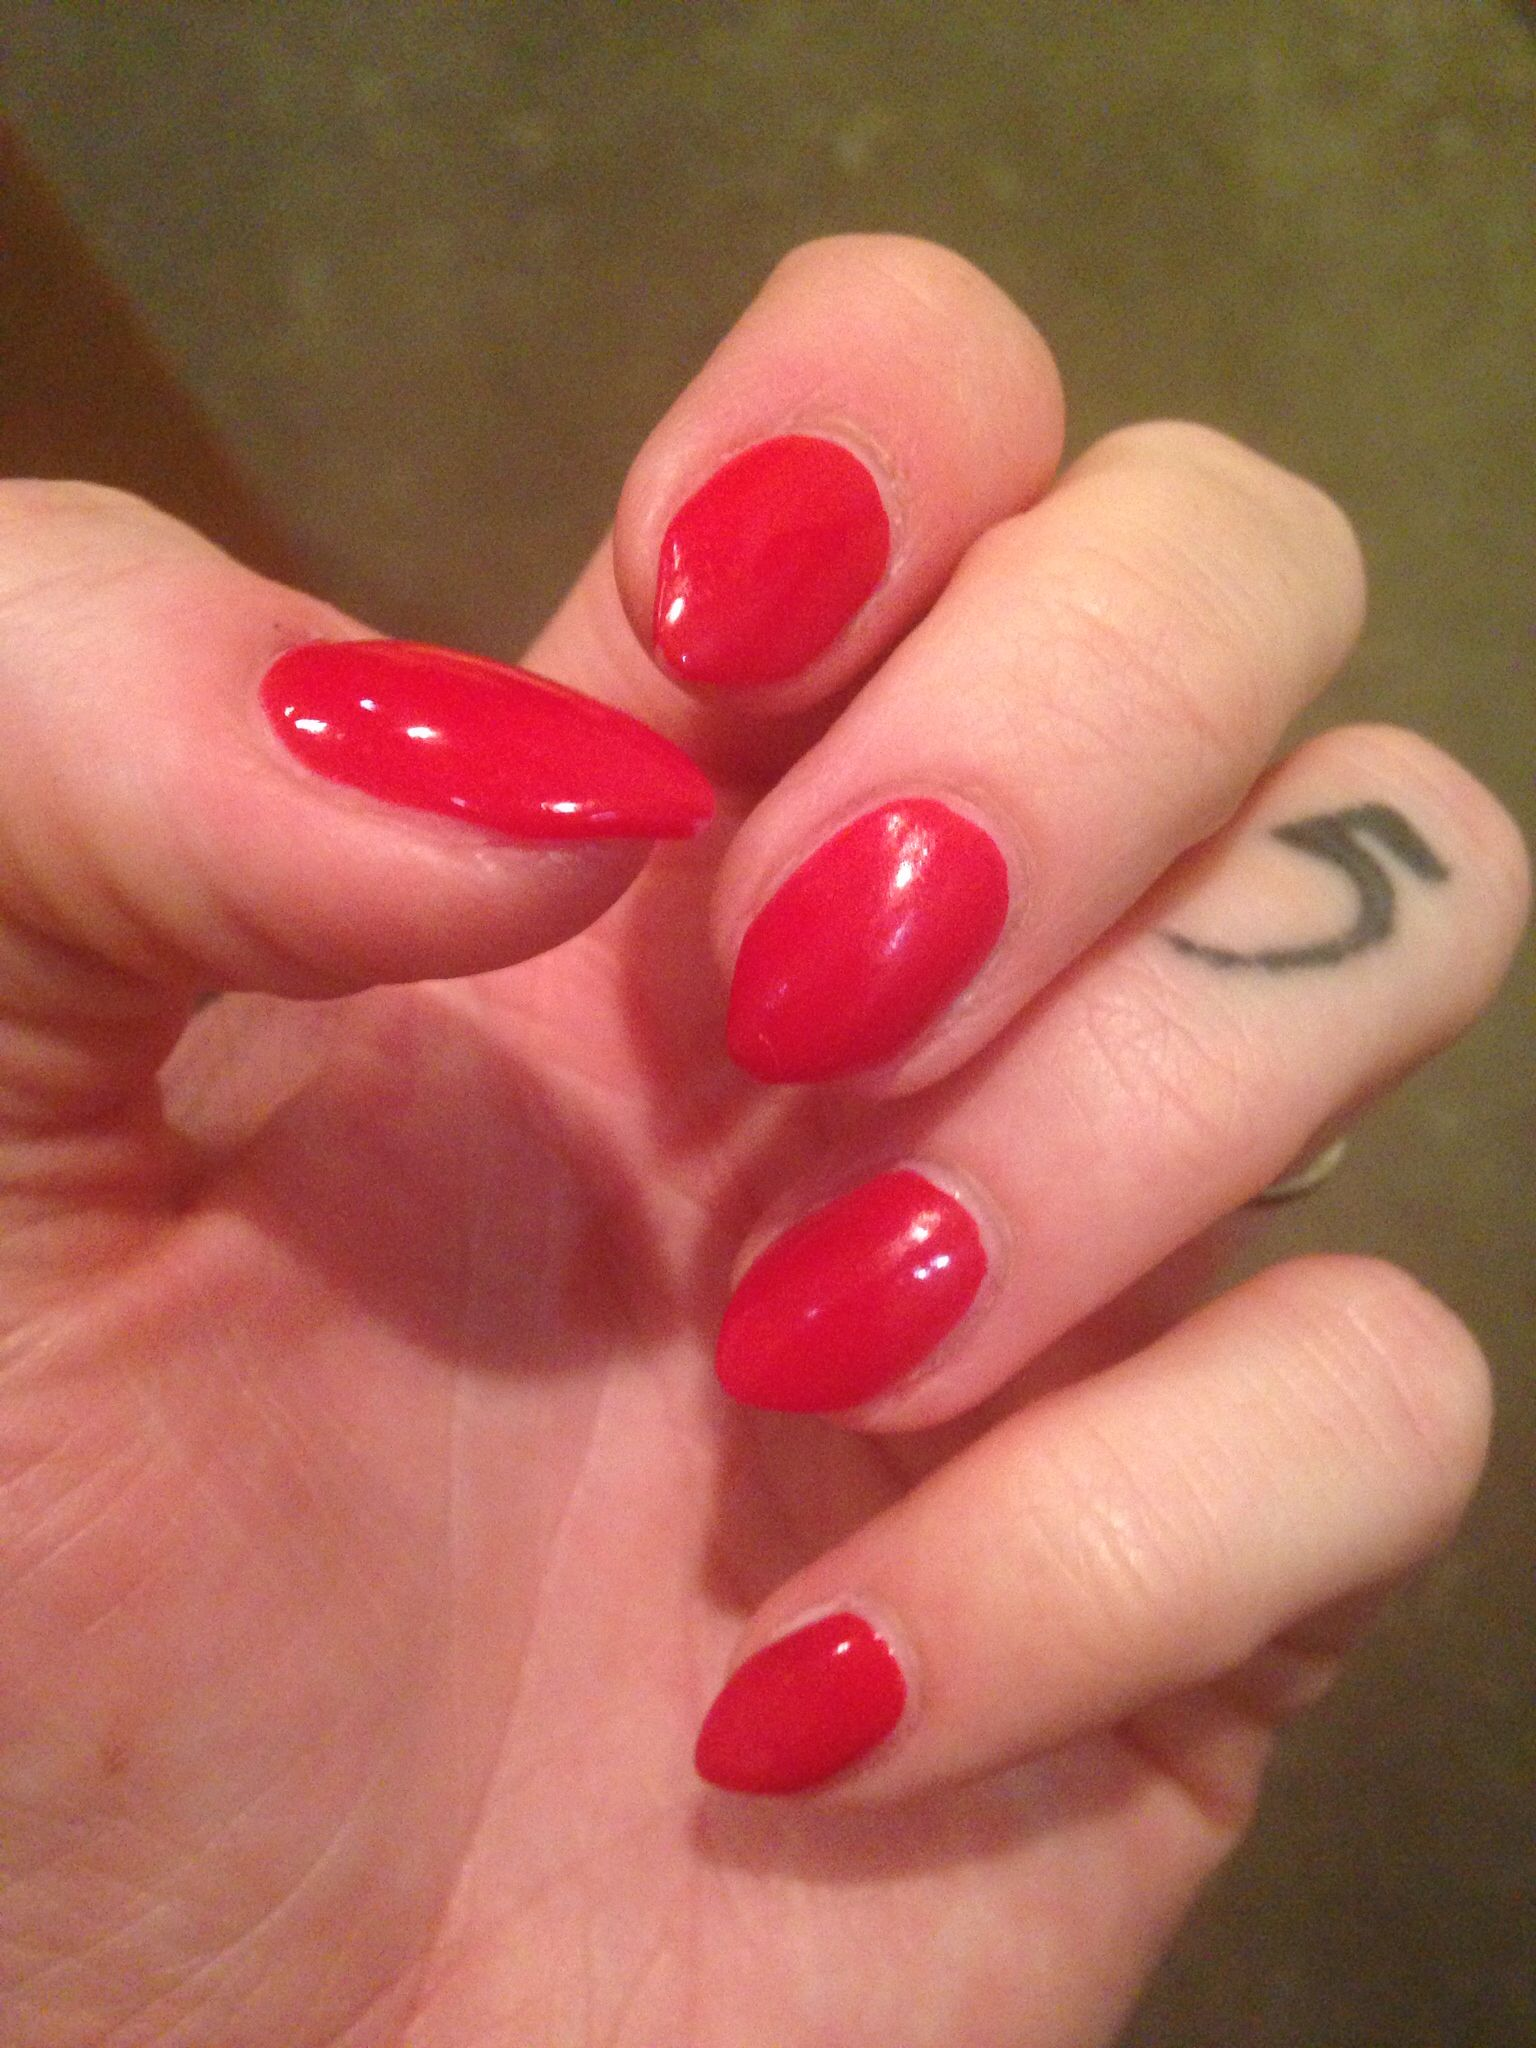 Short Red Stiletto Nails Red Stiletto Nails Short Red Nails